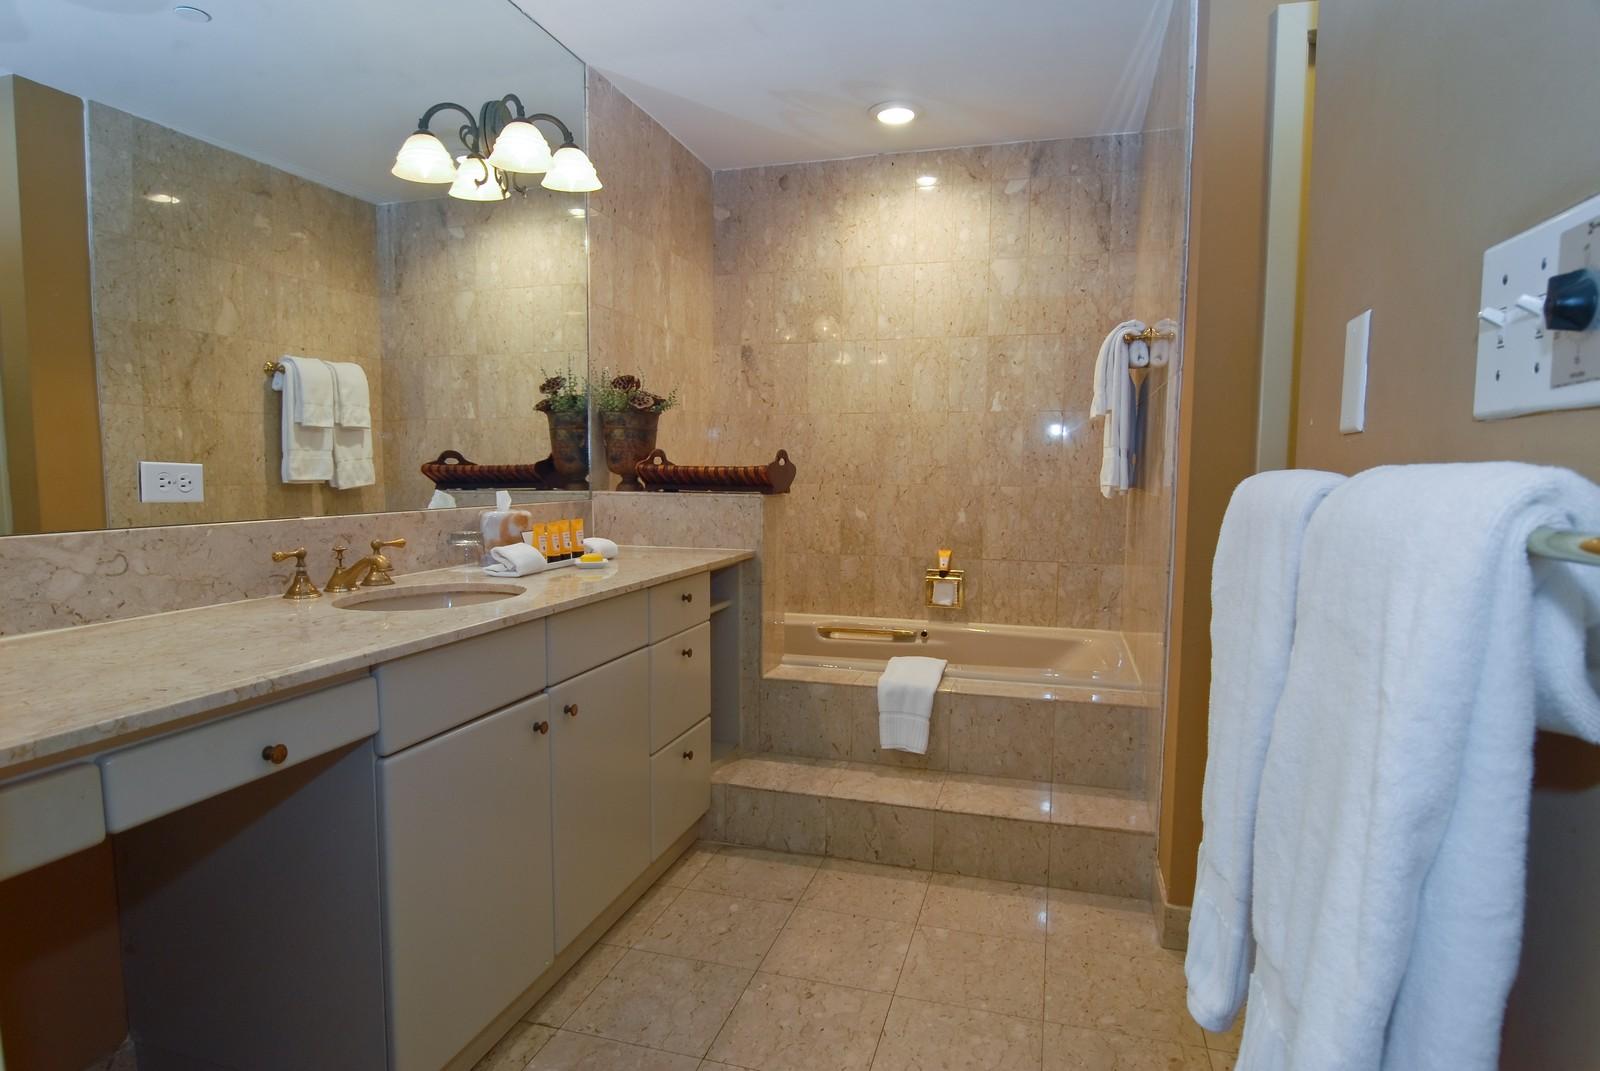 Real Estate Photography - 19124 Fisher Island Drive, Fisher Island, FL, 33109 - Master Bathroom